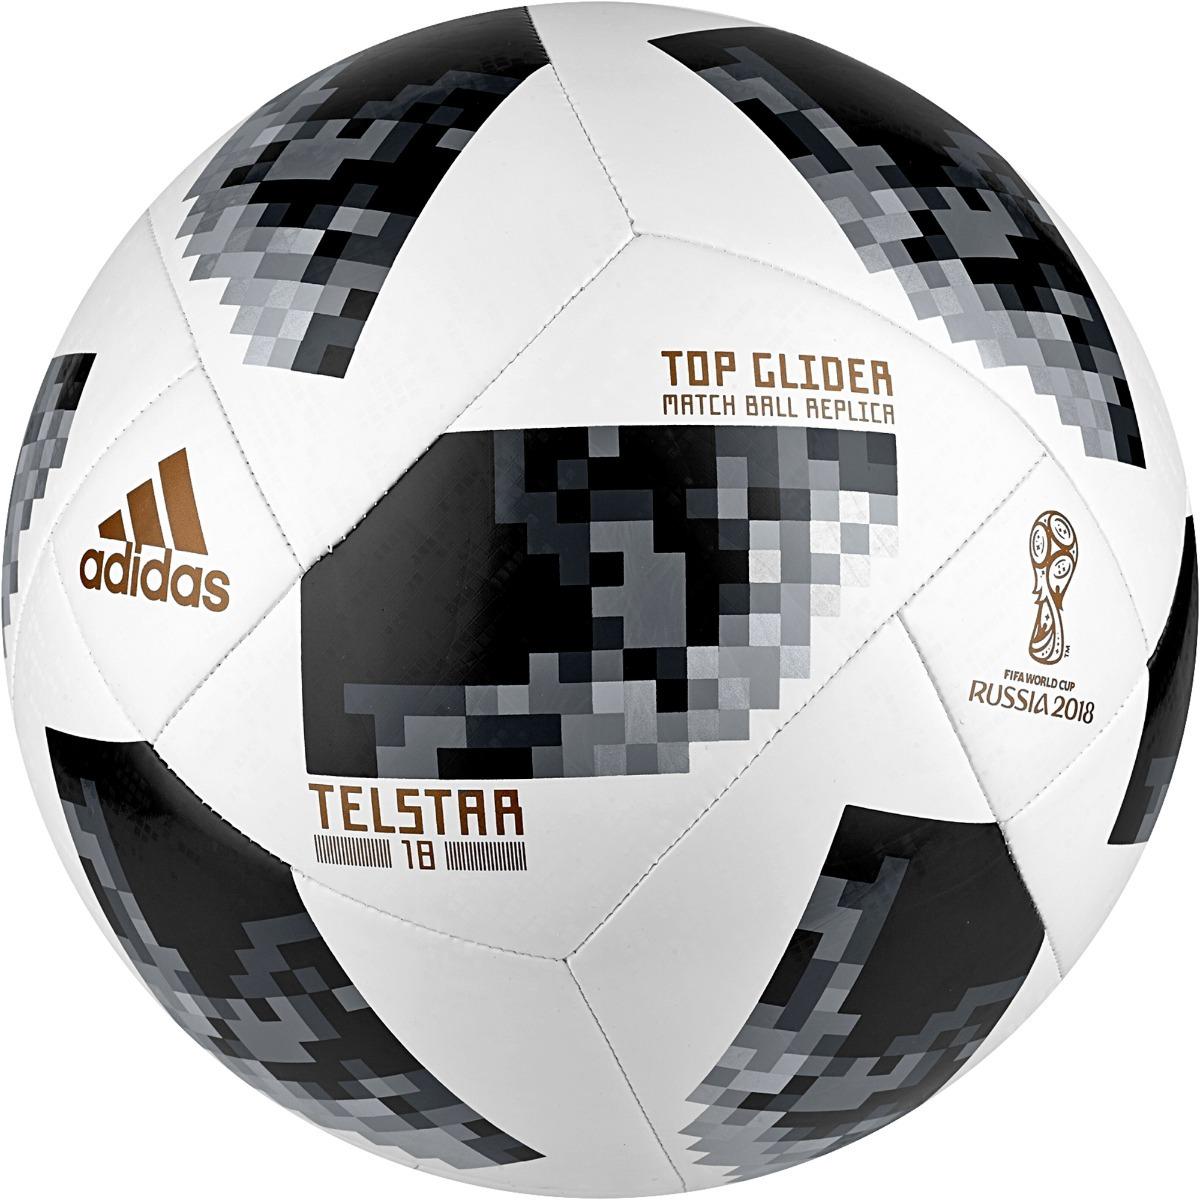 pelota adidas mundial rusia 2018 glider cosida n°5 - adidas. Cargando zoom. 64b4c1a29105d